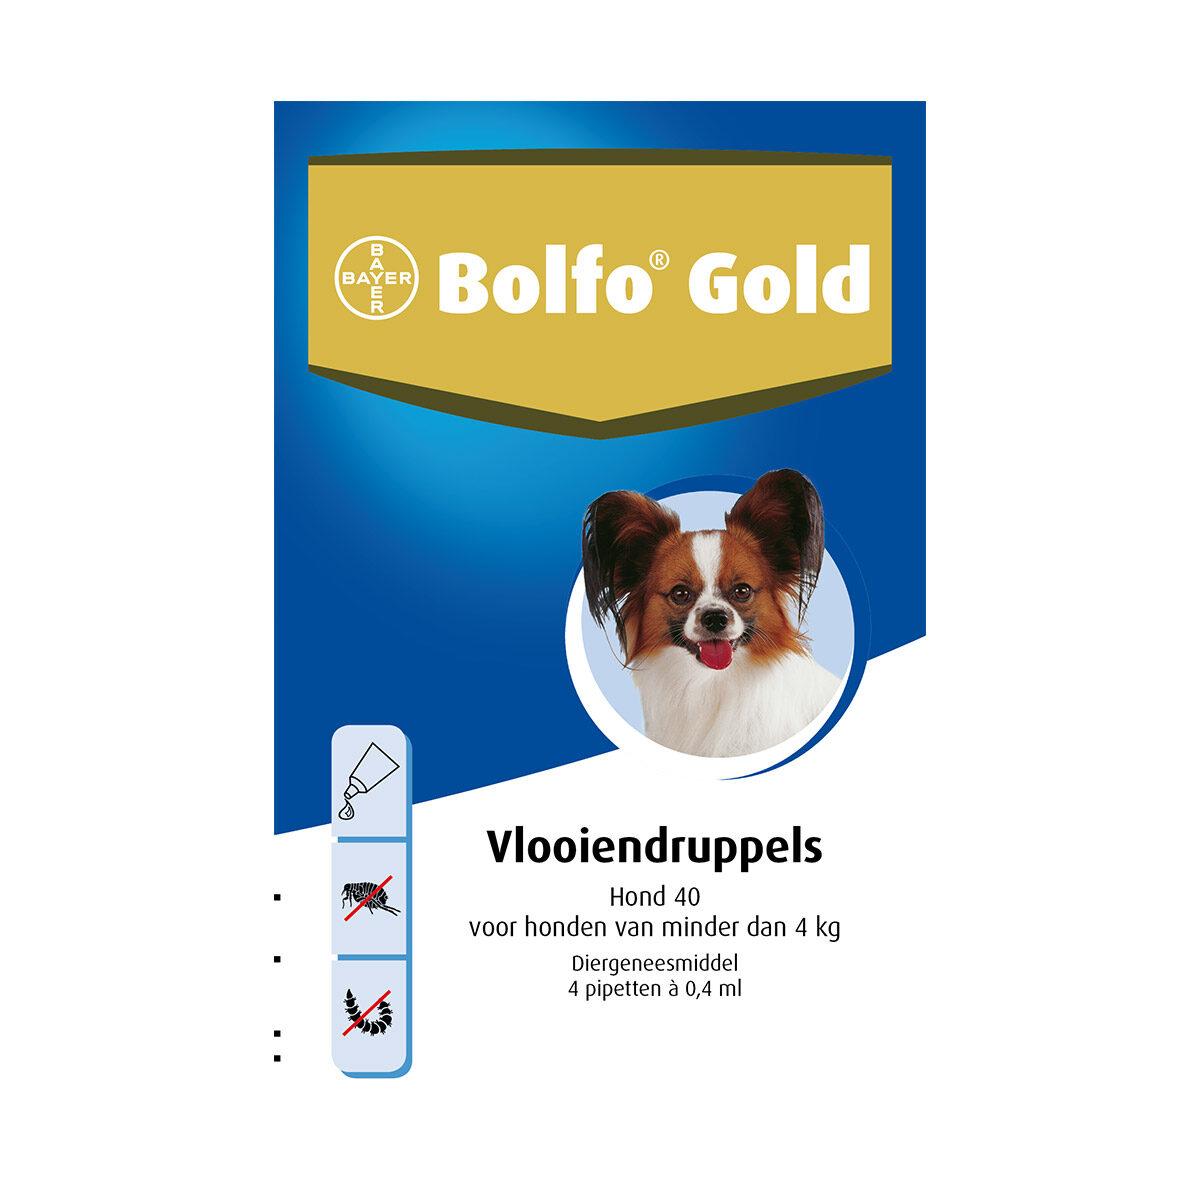 Bolfo Gold Hond 40 Vlooiendruppels tot 4 kg 4 Pipetten